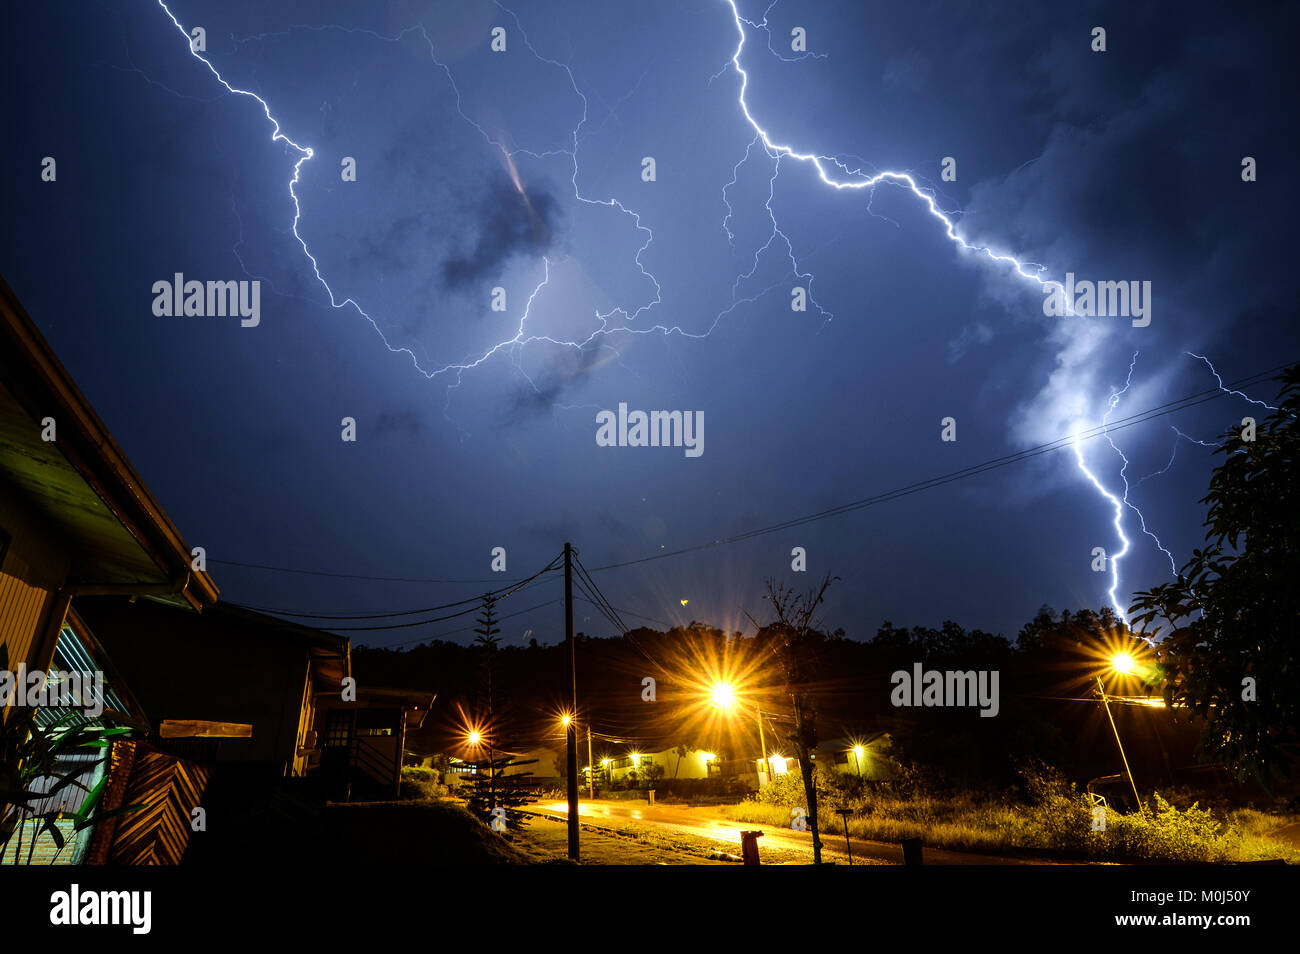 Lightning strike during thunderstorm in Sorowako, South Sulawesi Indonesia. - Stock Image